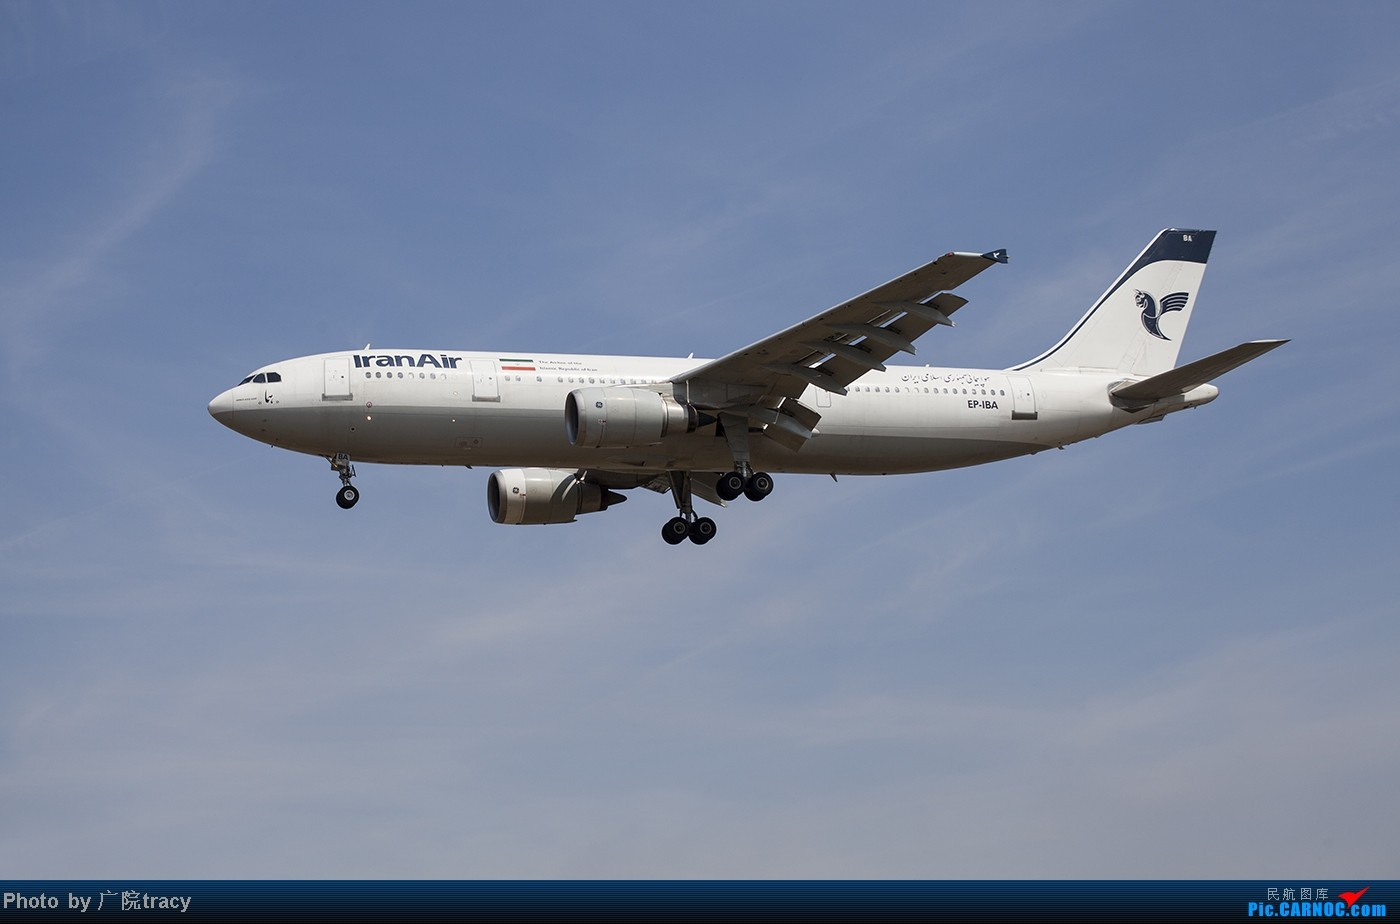 Re:[原创]★ ★ ★ ★ ★中东的航空公司在伦敦希斯罗国际机场  ★ ★ ★ ★ ★ AIRBUS A300-B4-600 EP-IBA 英国伦敦希思罗机场